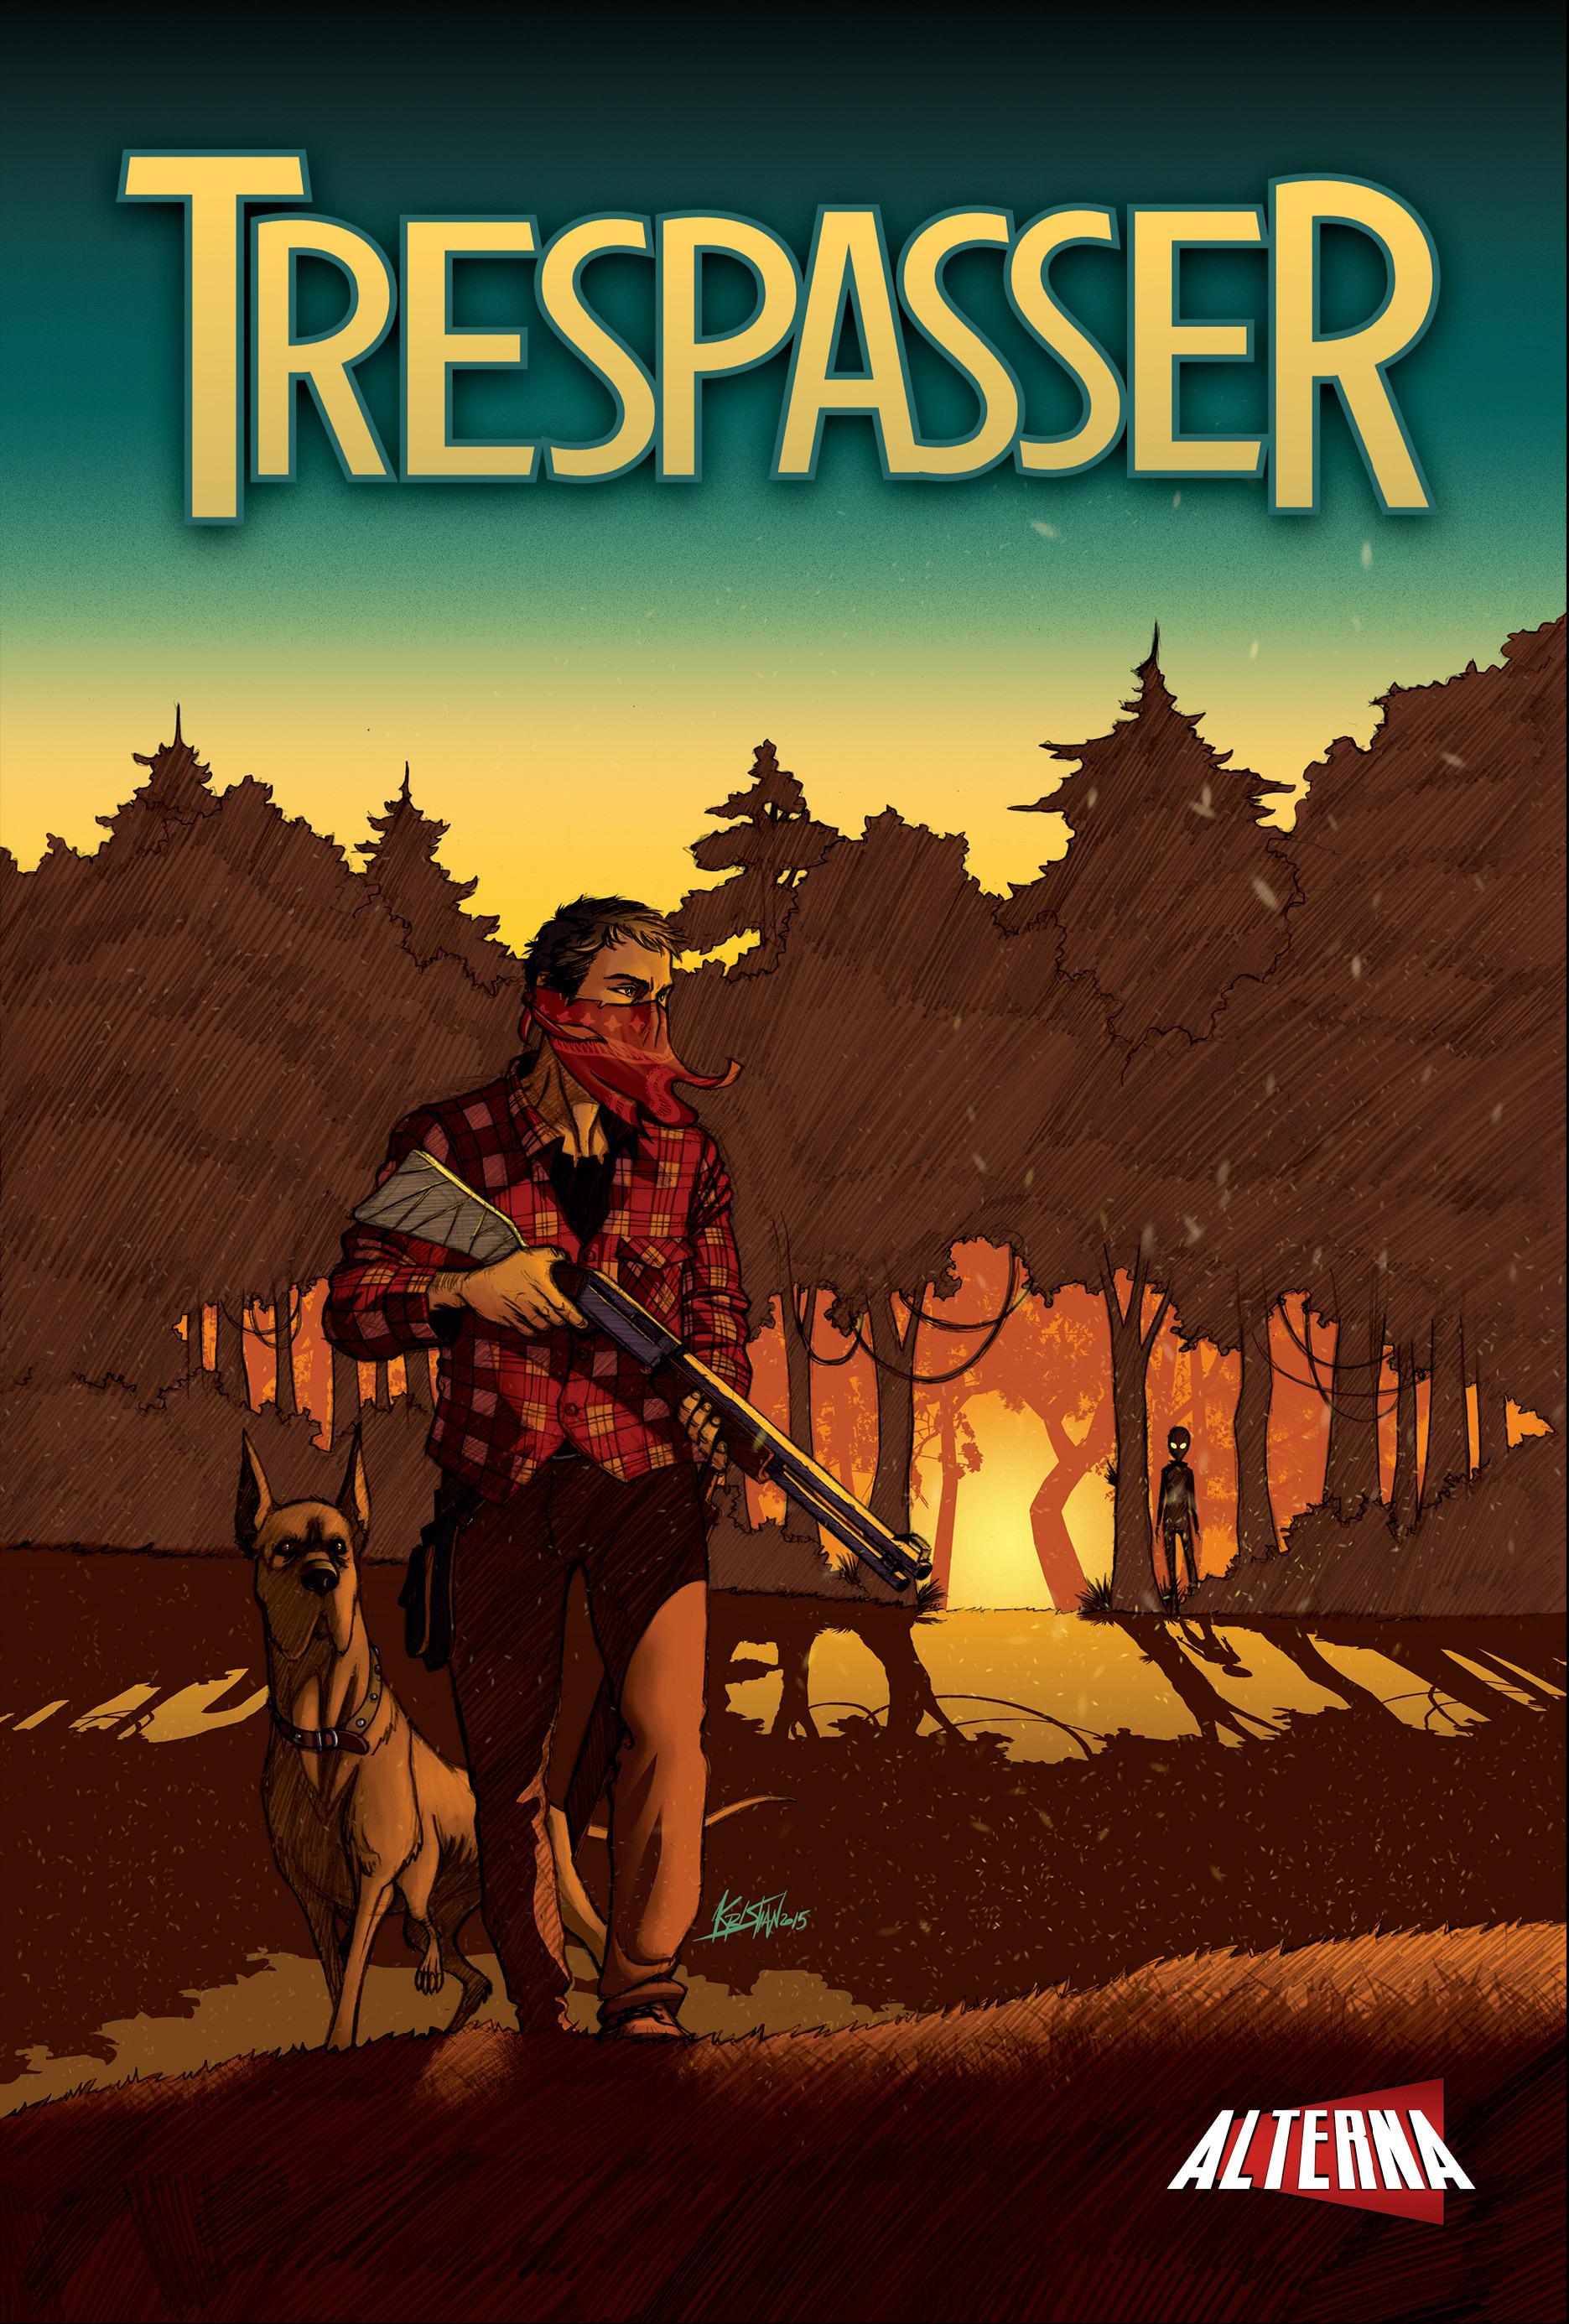 Read online Trespasser comic -  Issue #1 - 1